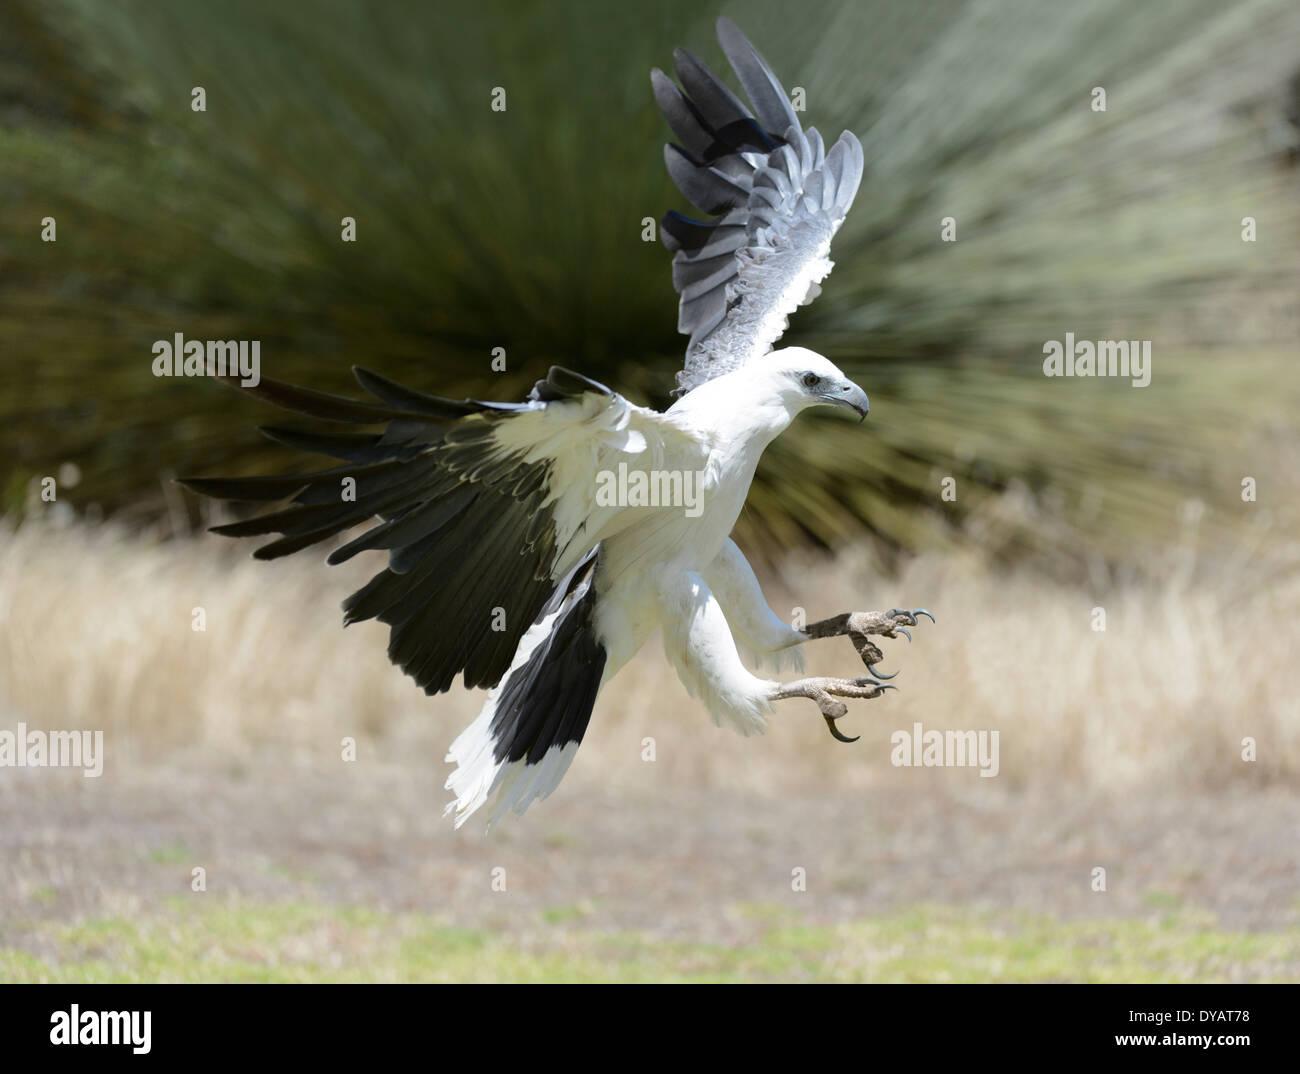 White-bellied Sea-eagle (Haliaeetus leucogaster) Stock Photo